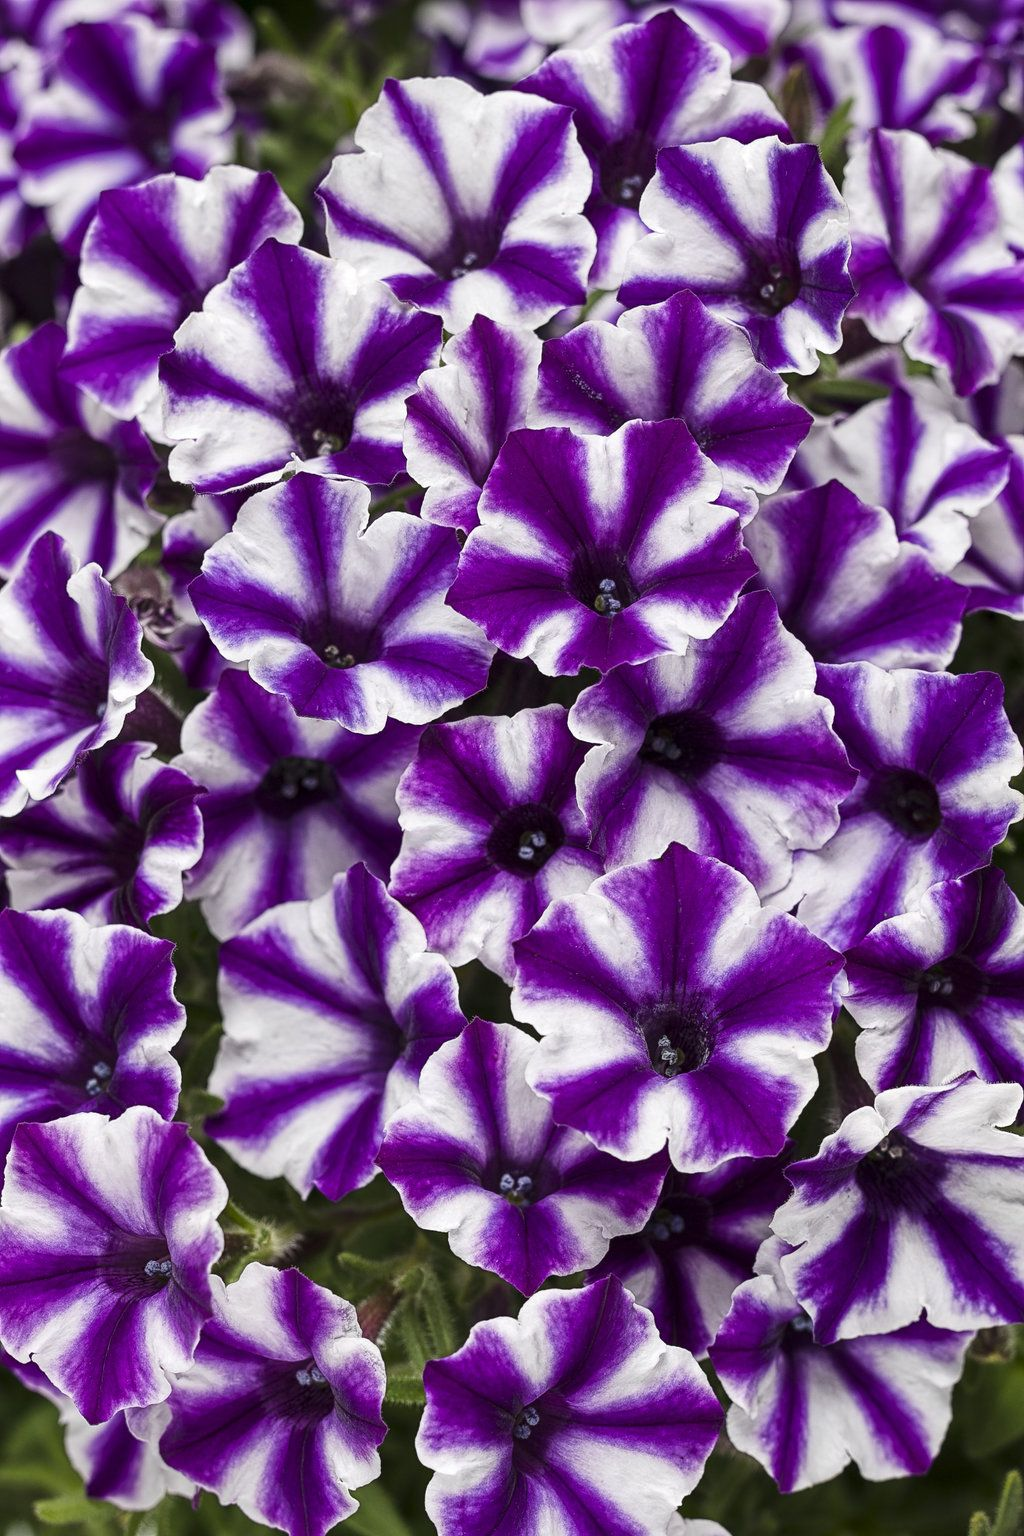 Supertunia Violet Star Charm Petunia Hybrid Proven Winners Petunia Flower Petunia Plant Petunias